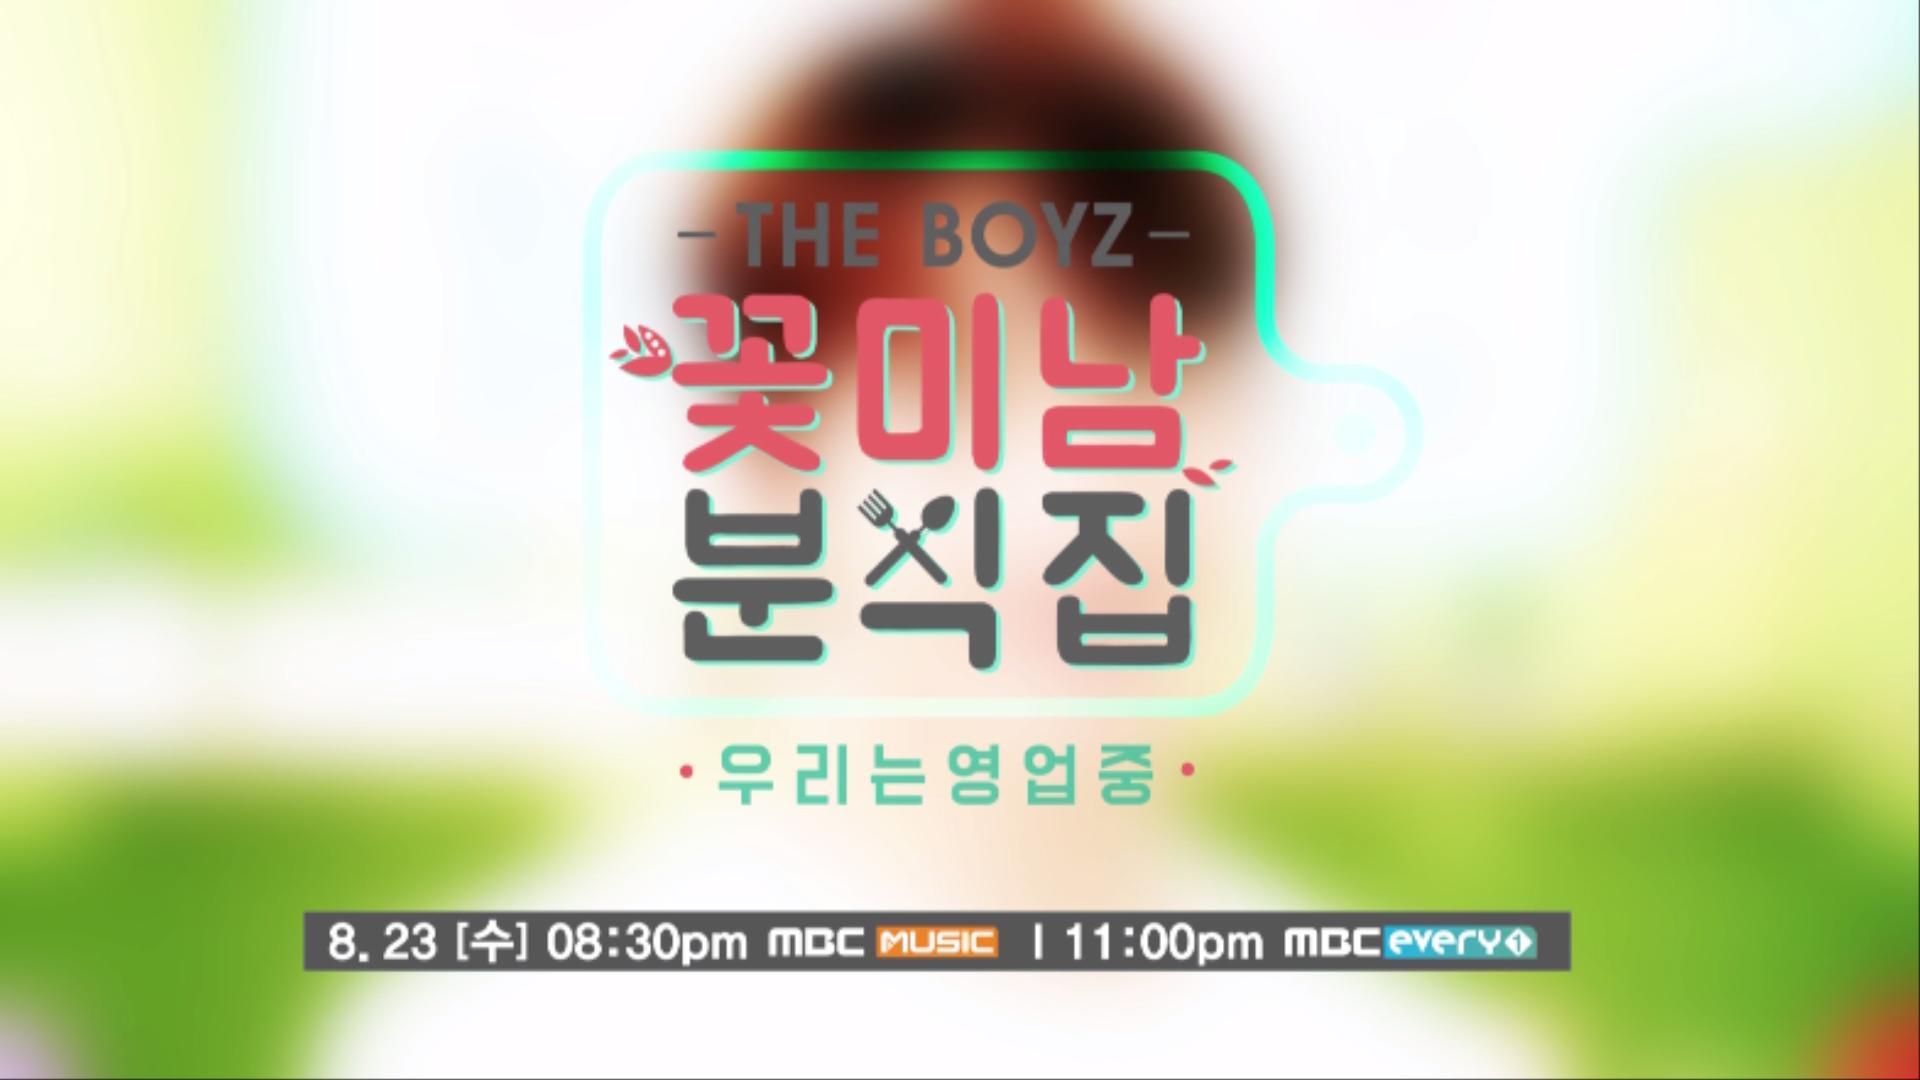 THE BOYZ '꽃미남 분식집' Teaser (상연X제이콥X큐X뉴)